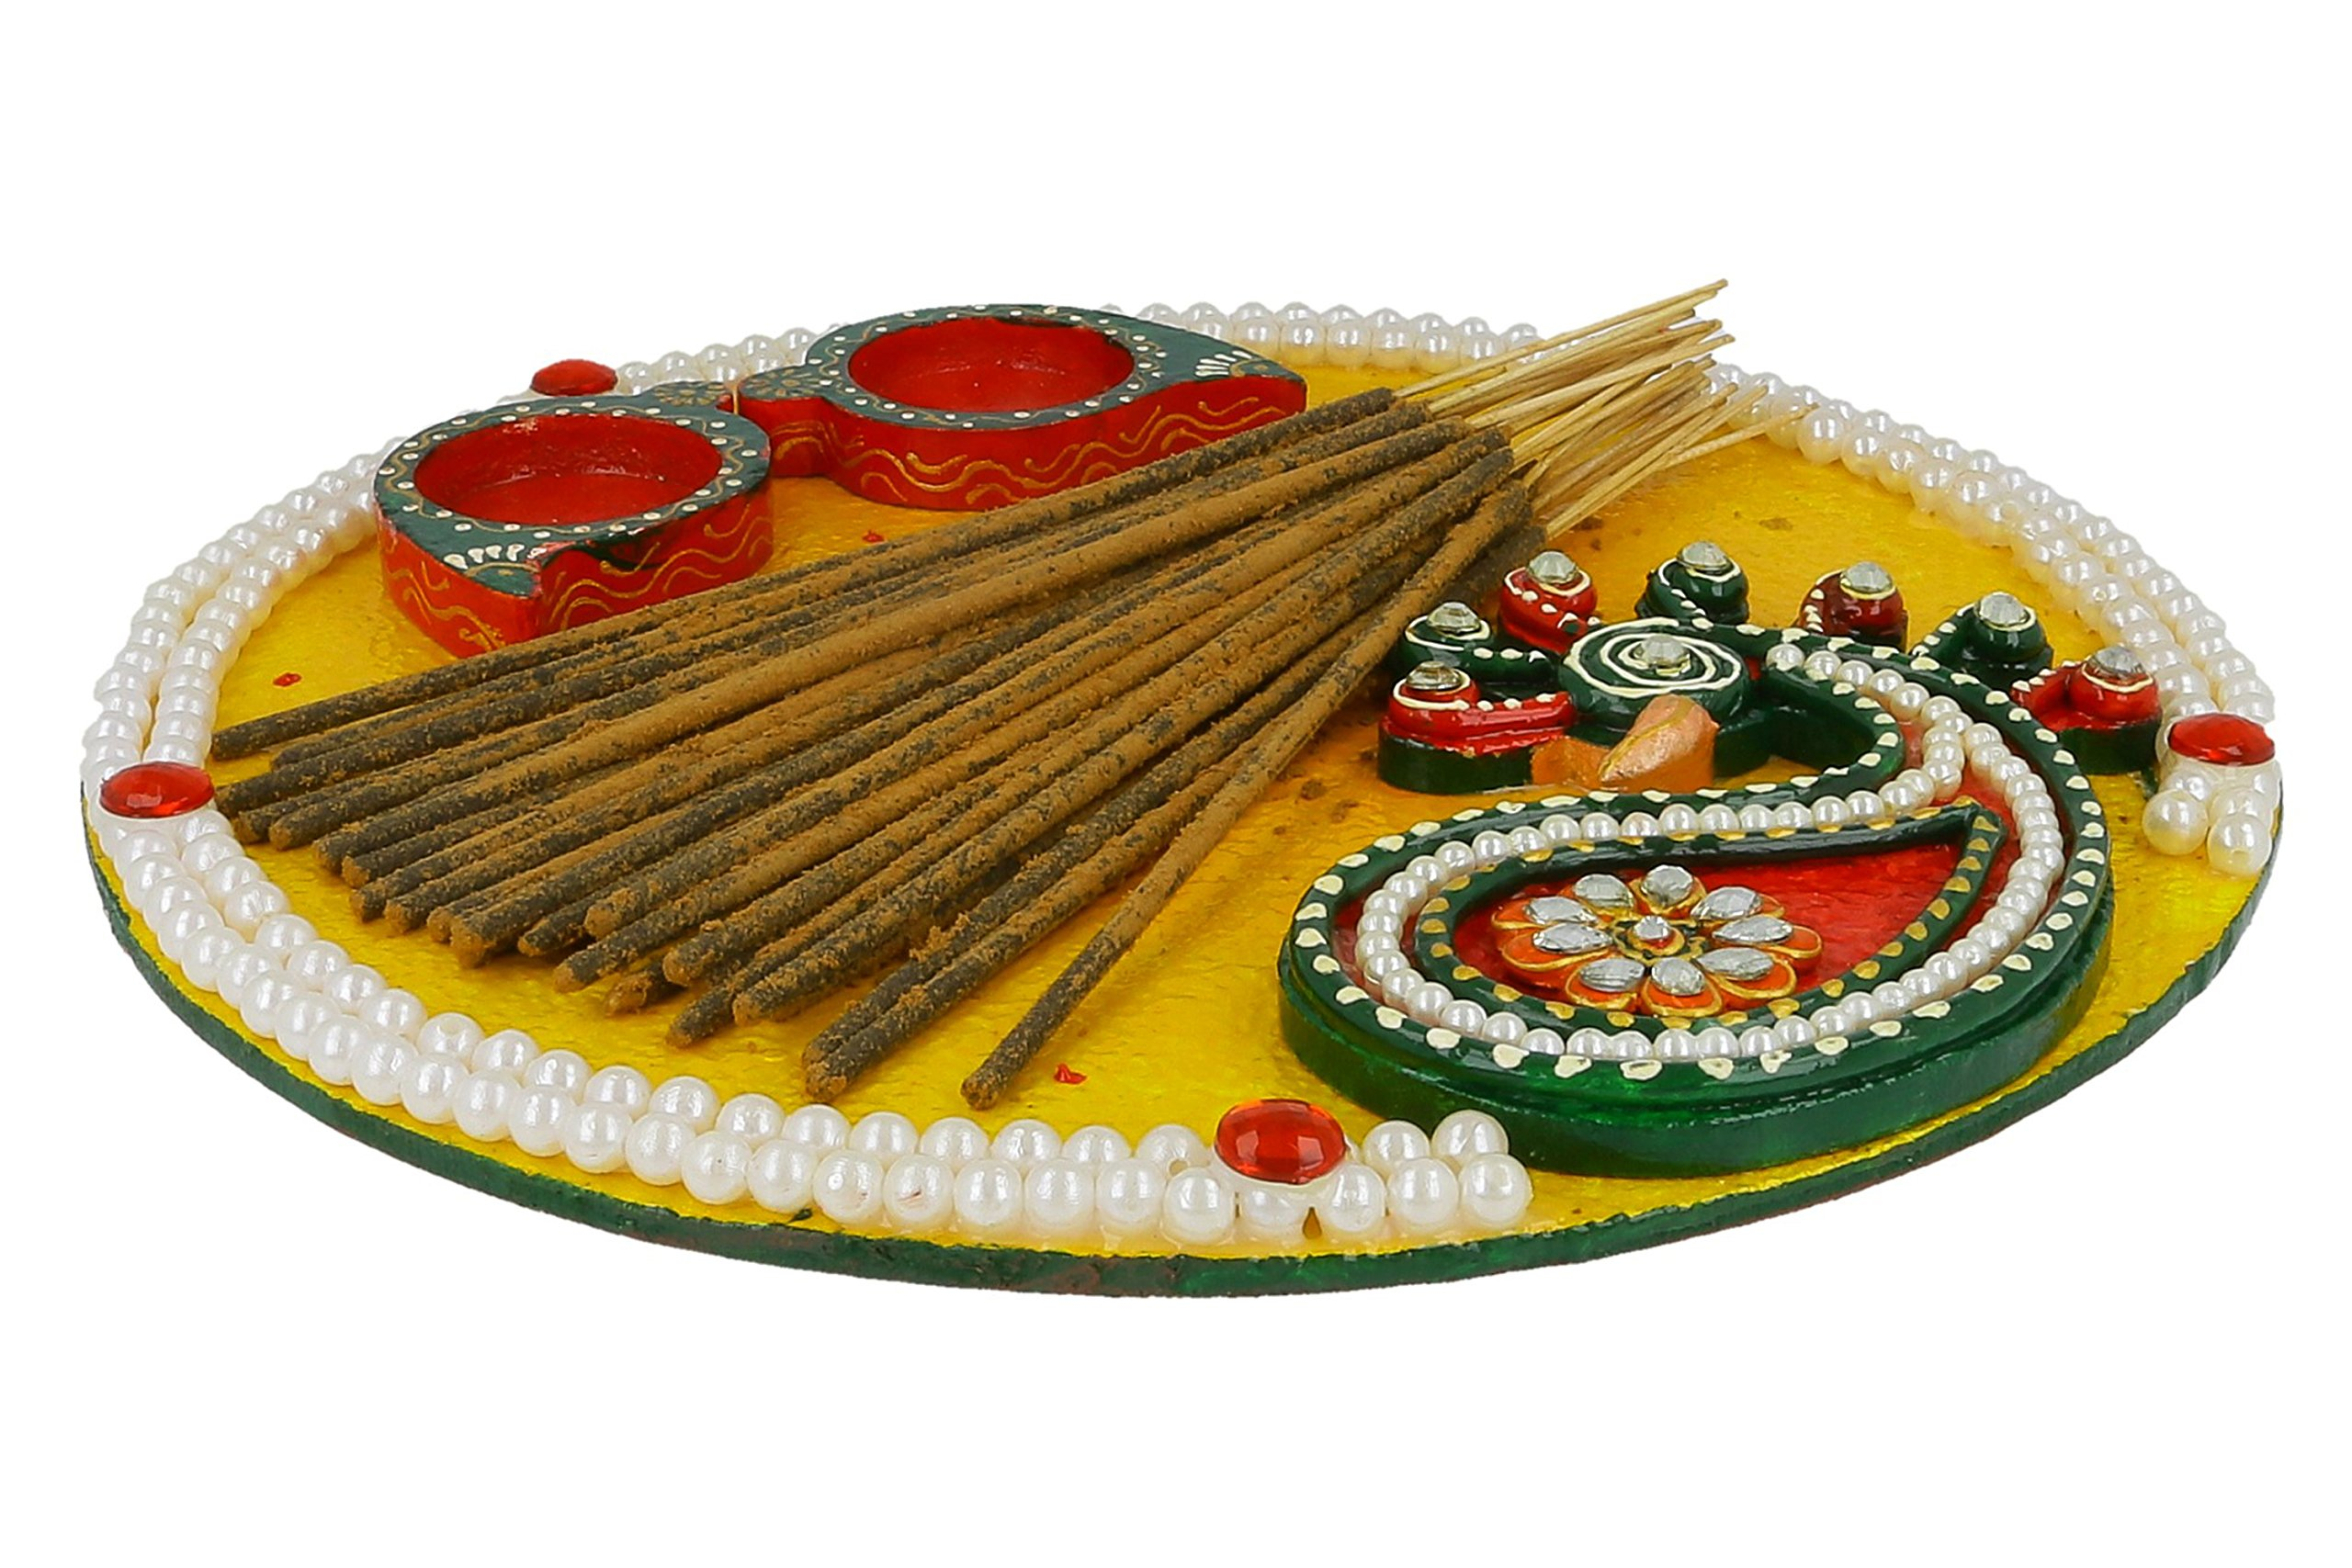 Nag Champa Incense Sticks - Handmade 100% Natural - 350 Gms By RawyalCrafts